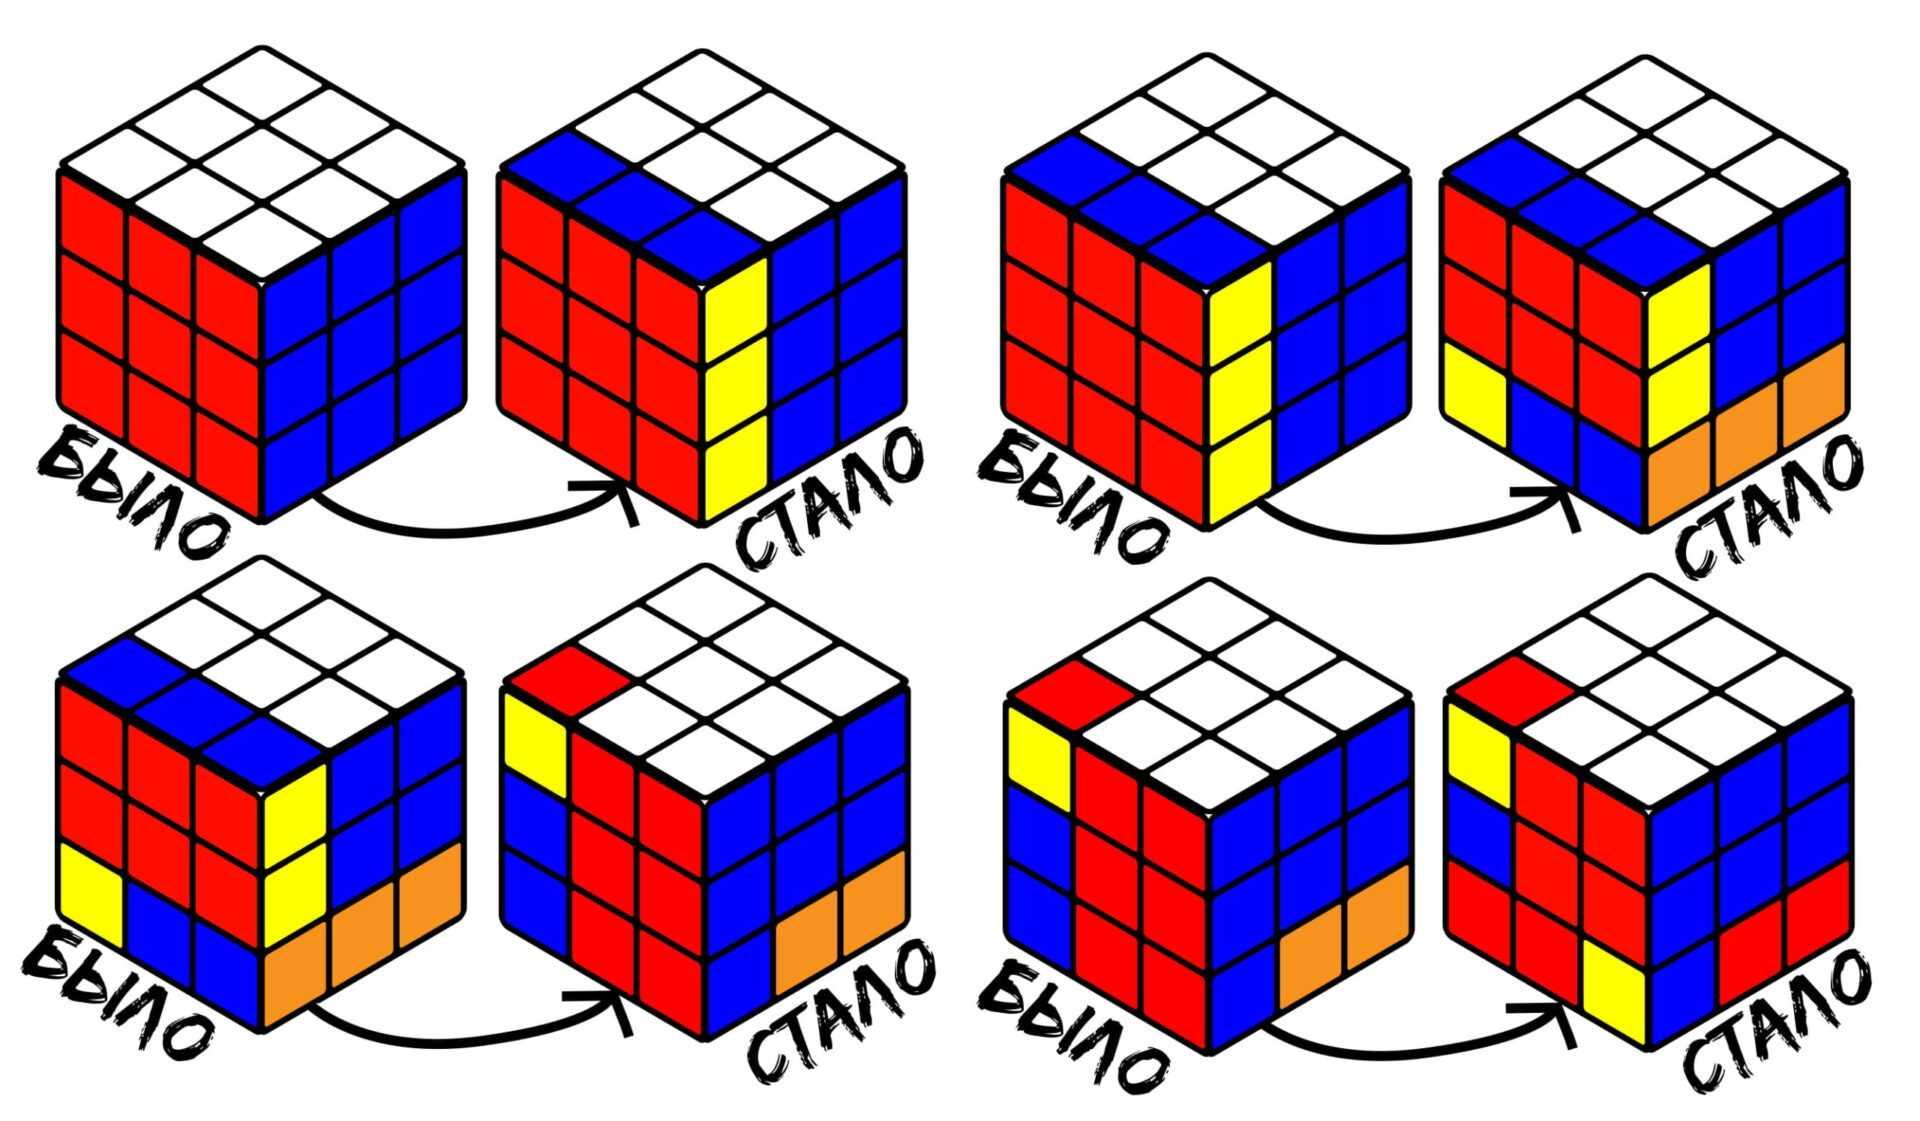 Кубик Рубика для углов